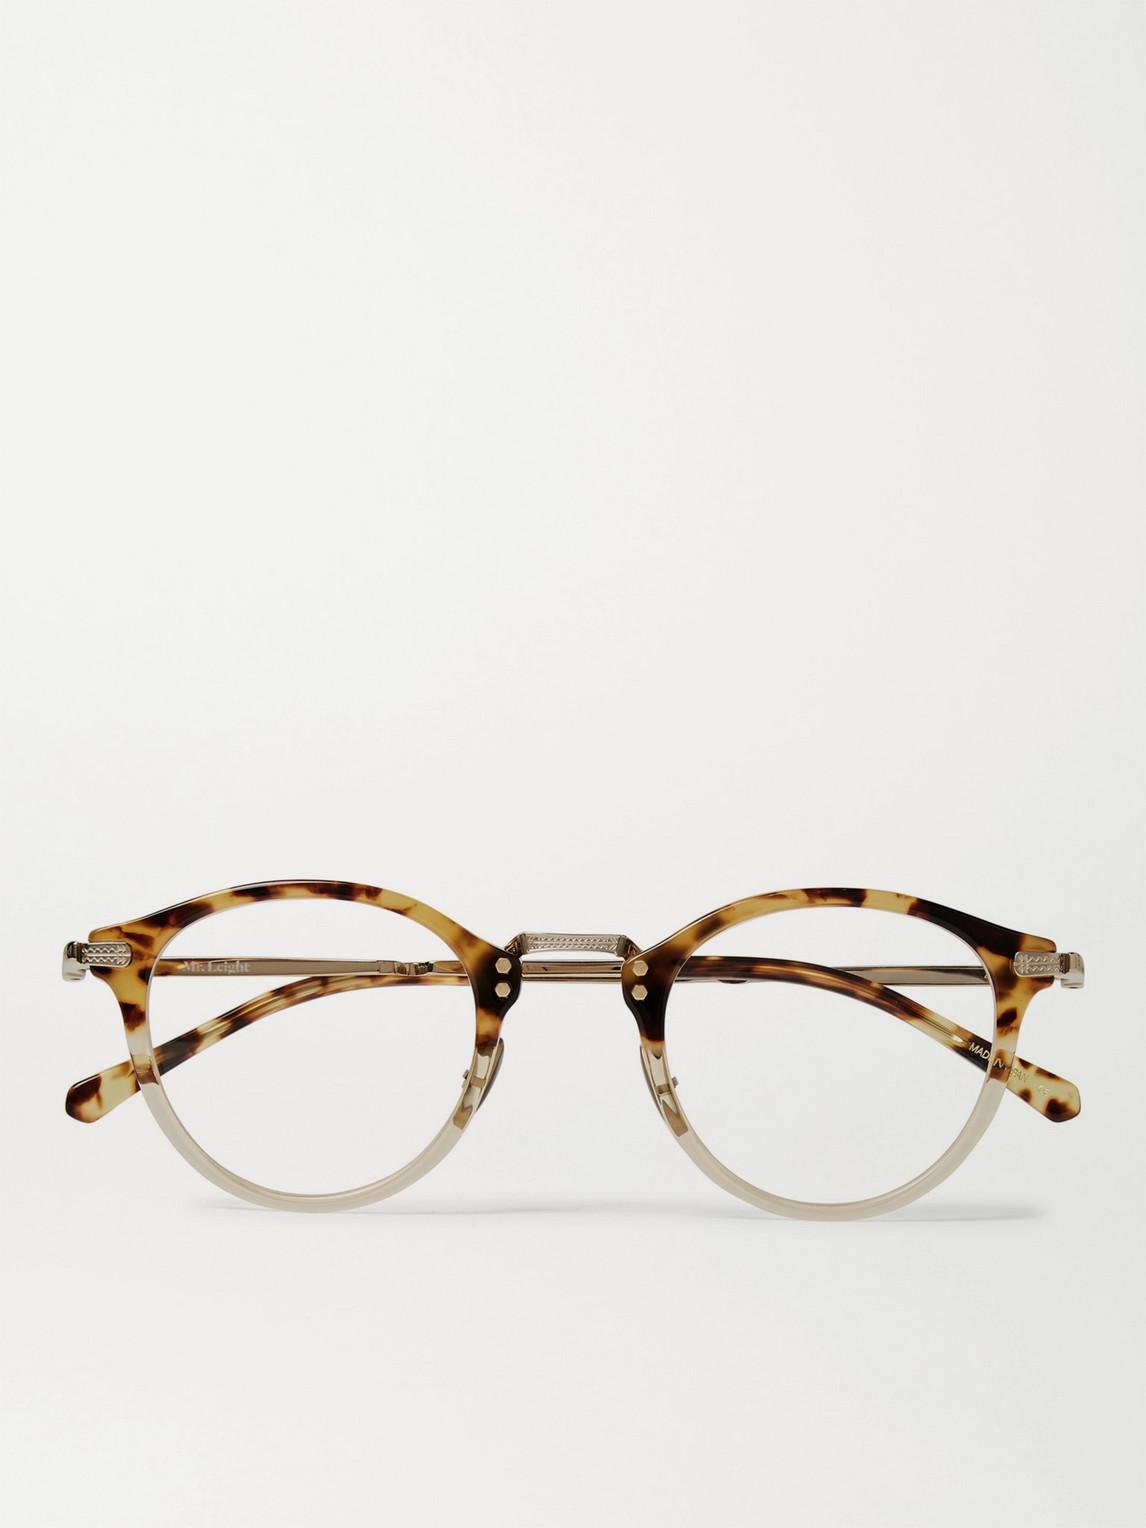 mr leight - stanley c round-frame tortoiseshell acetate and gold-tone titanium optical glasses - men - tortoiseshell